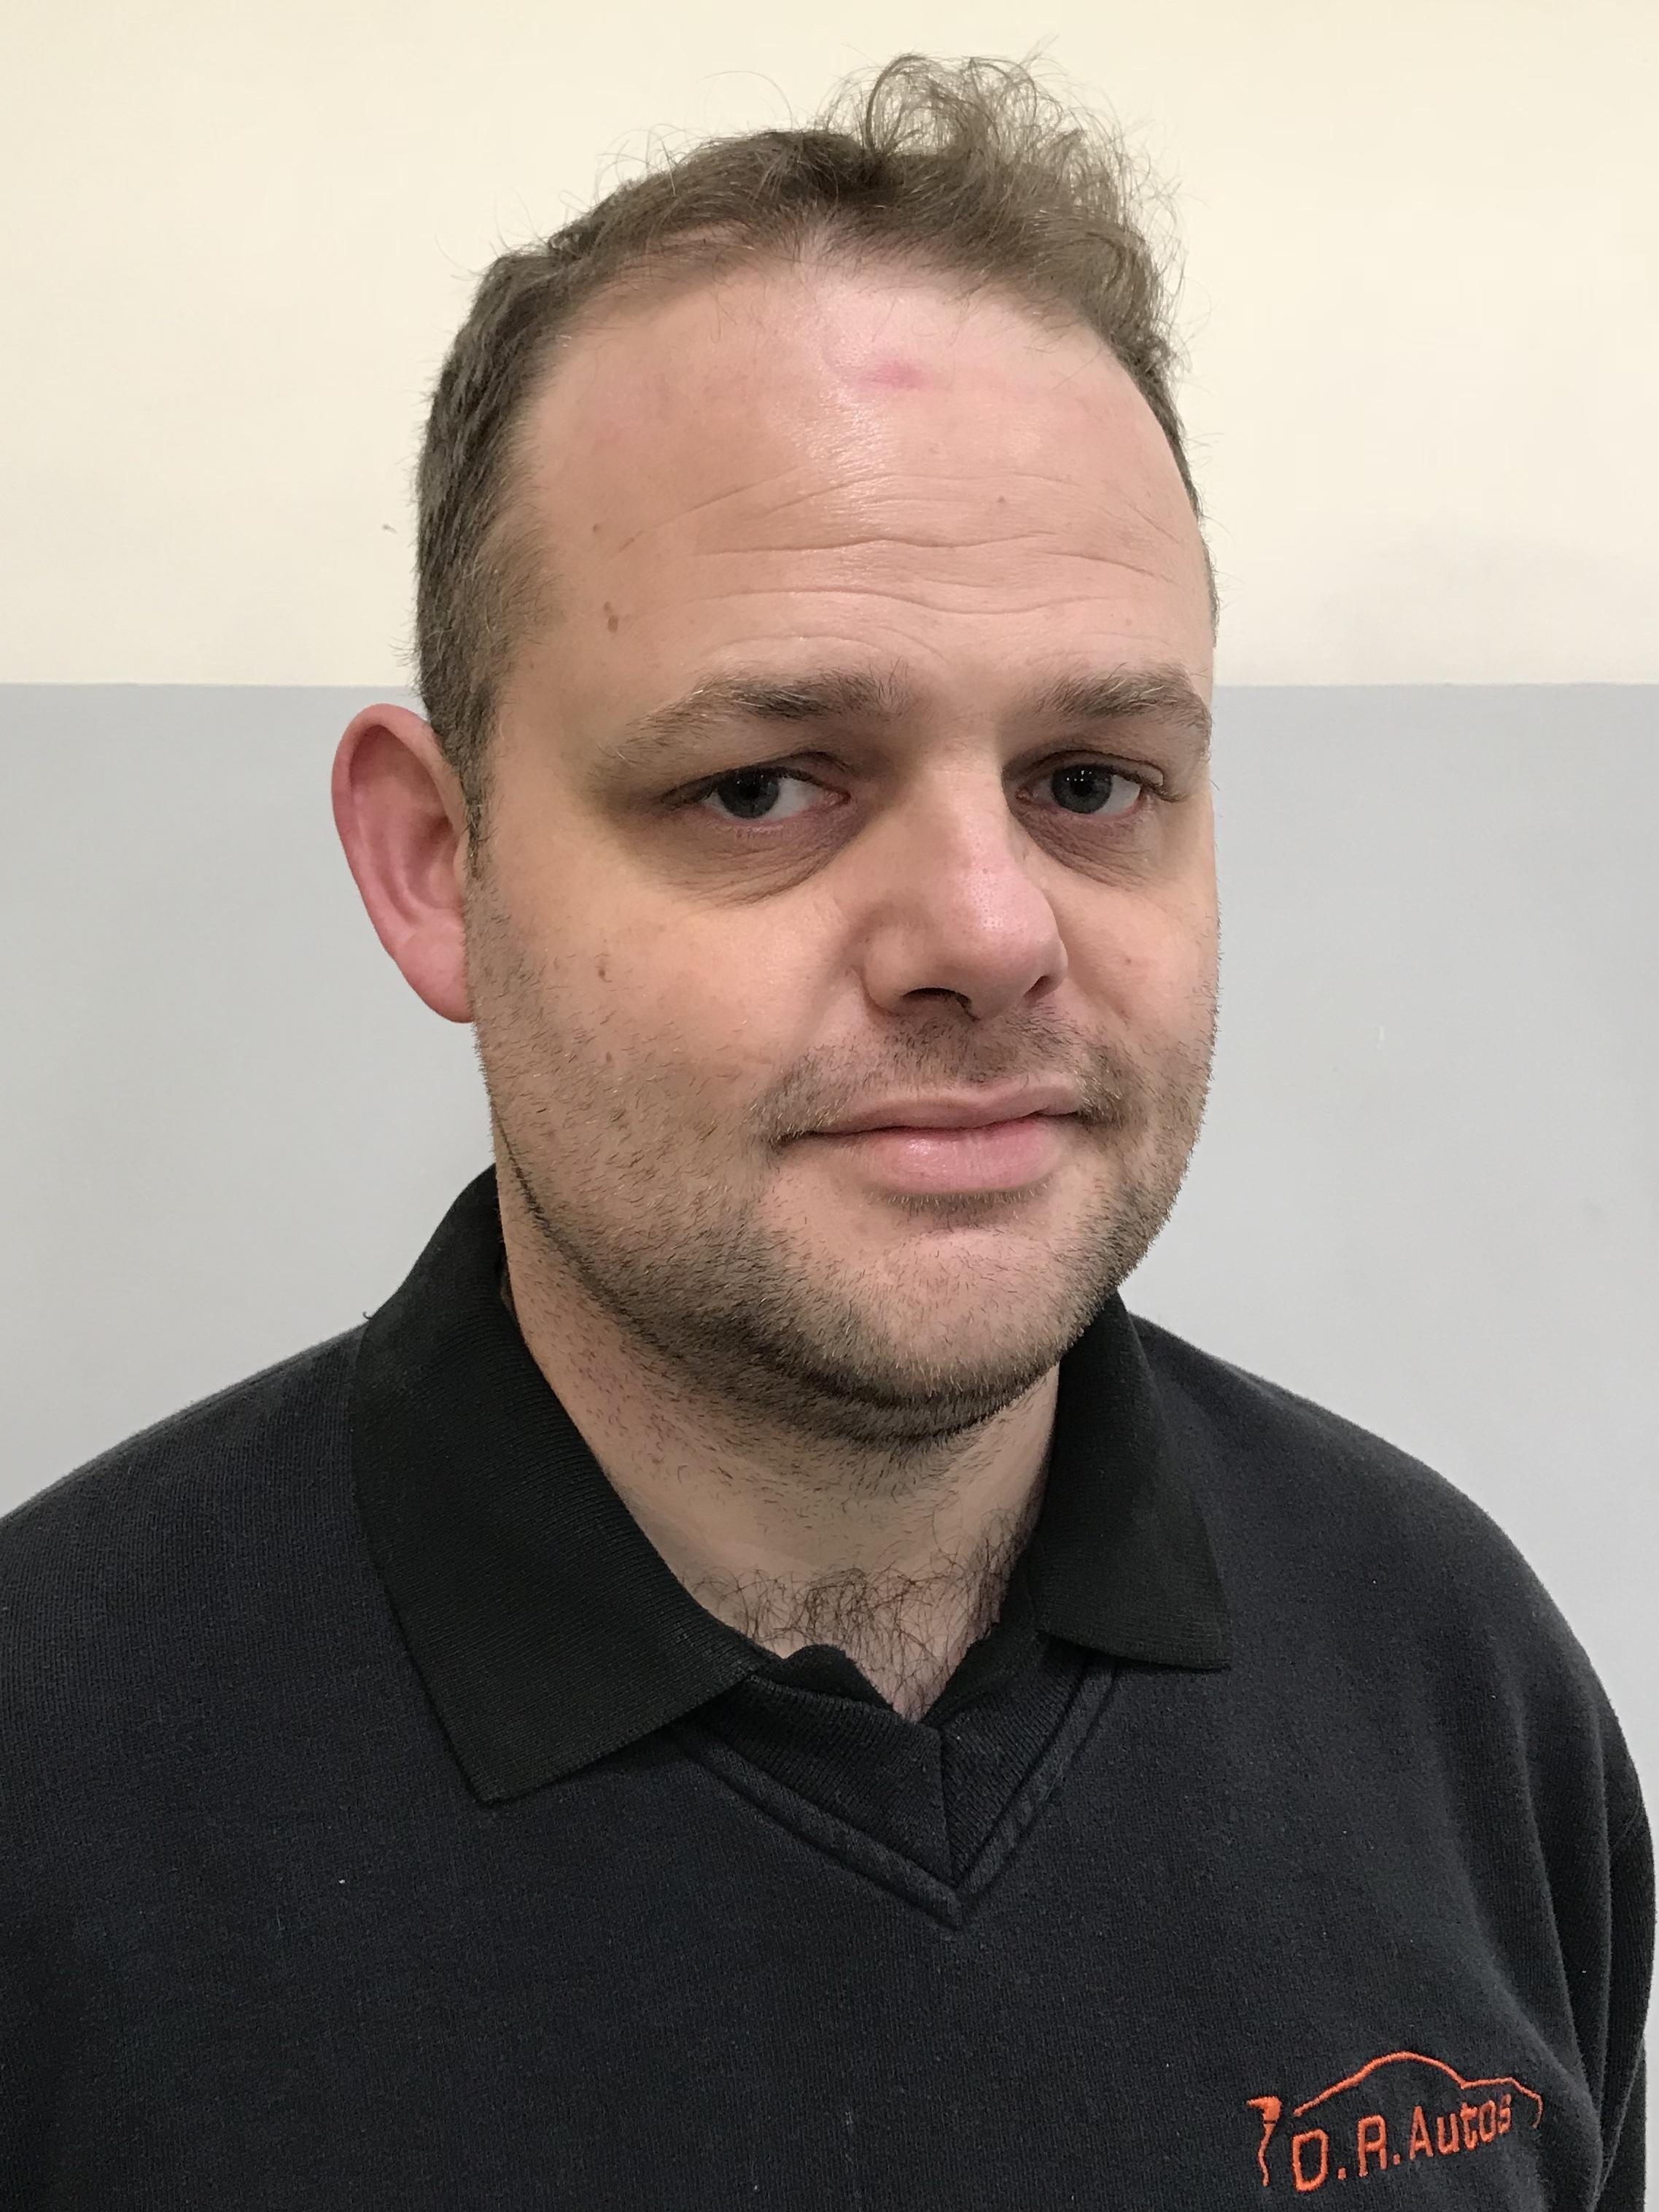 Darren Smith - MOT Tester, Technician